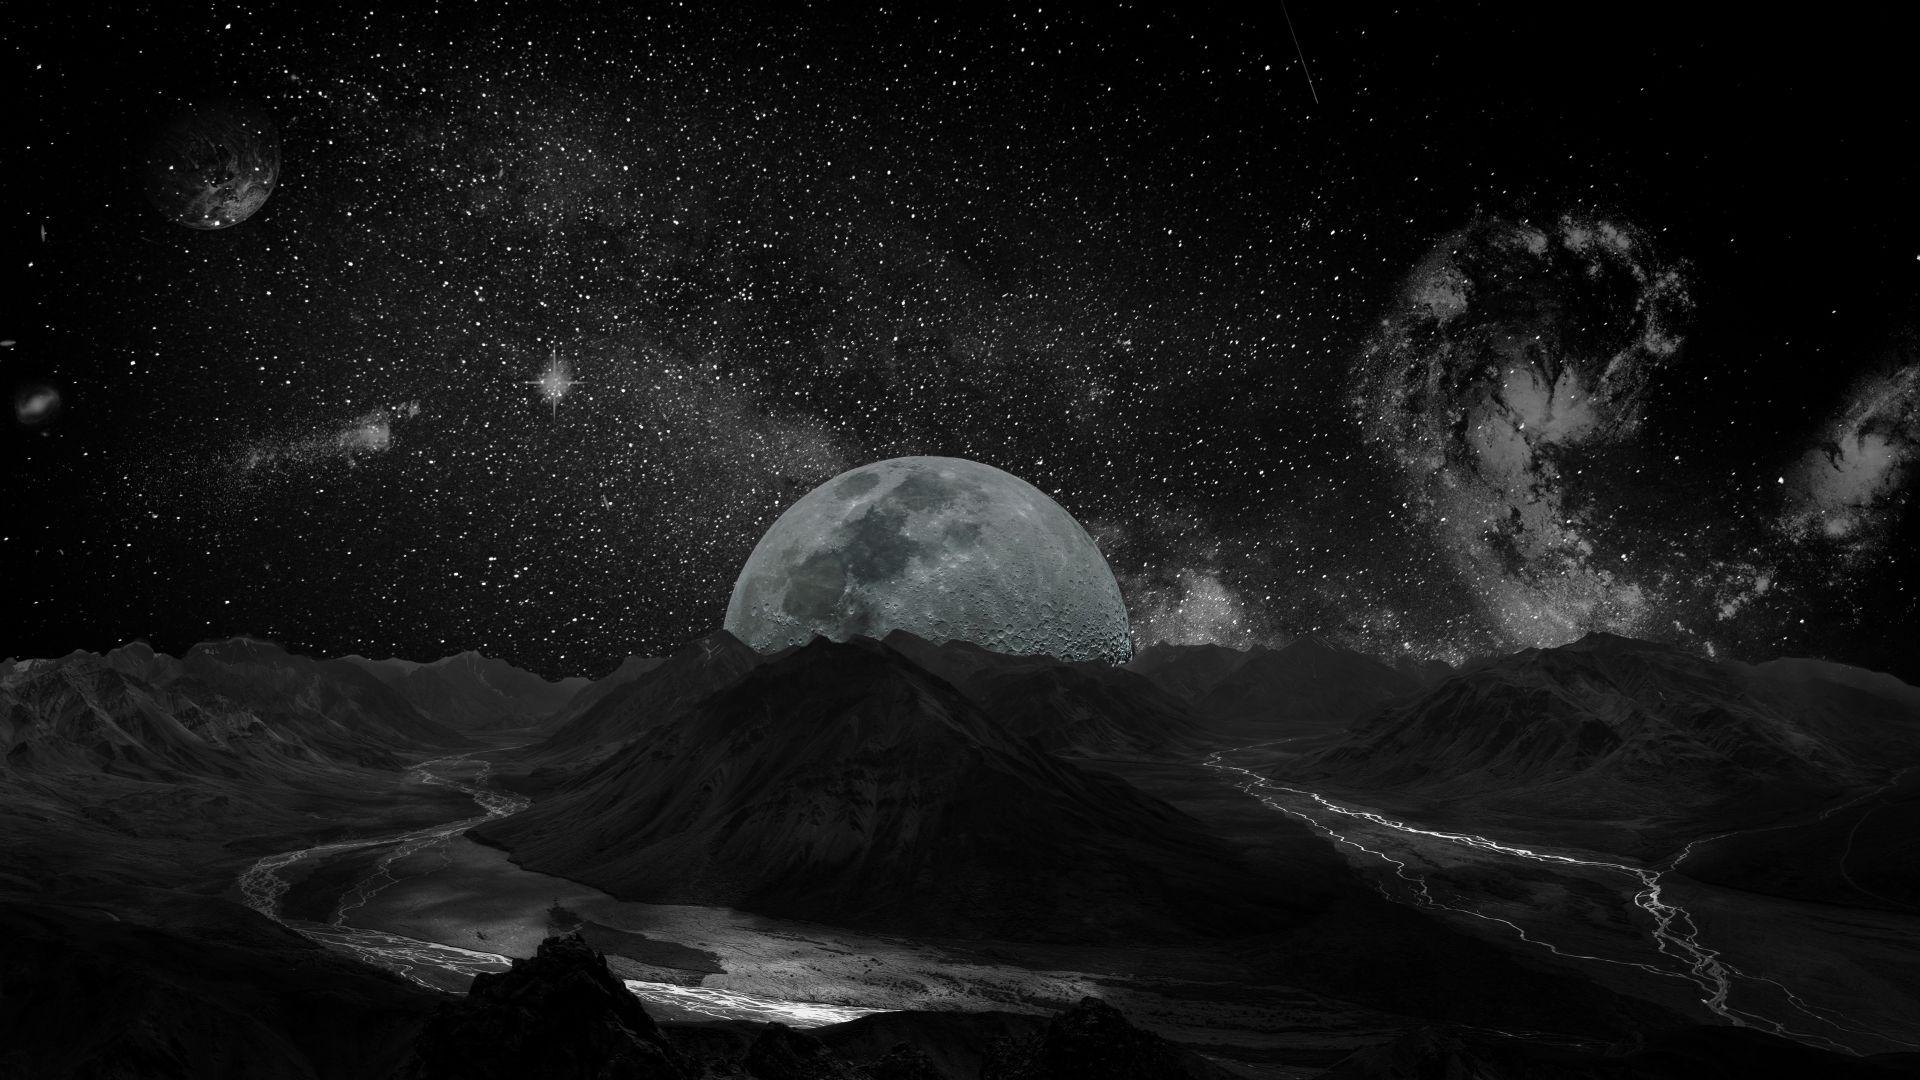 Black Book Cars >> Wallpaper moon, planet, space, milky way, 5k, Space #17041